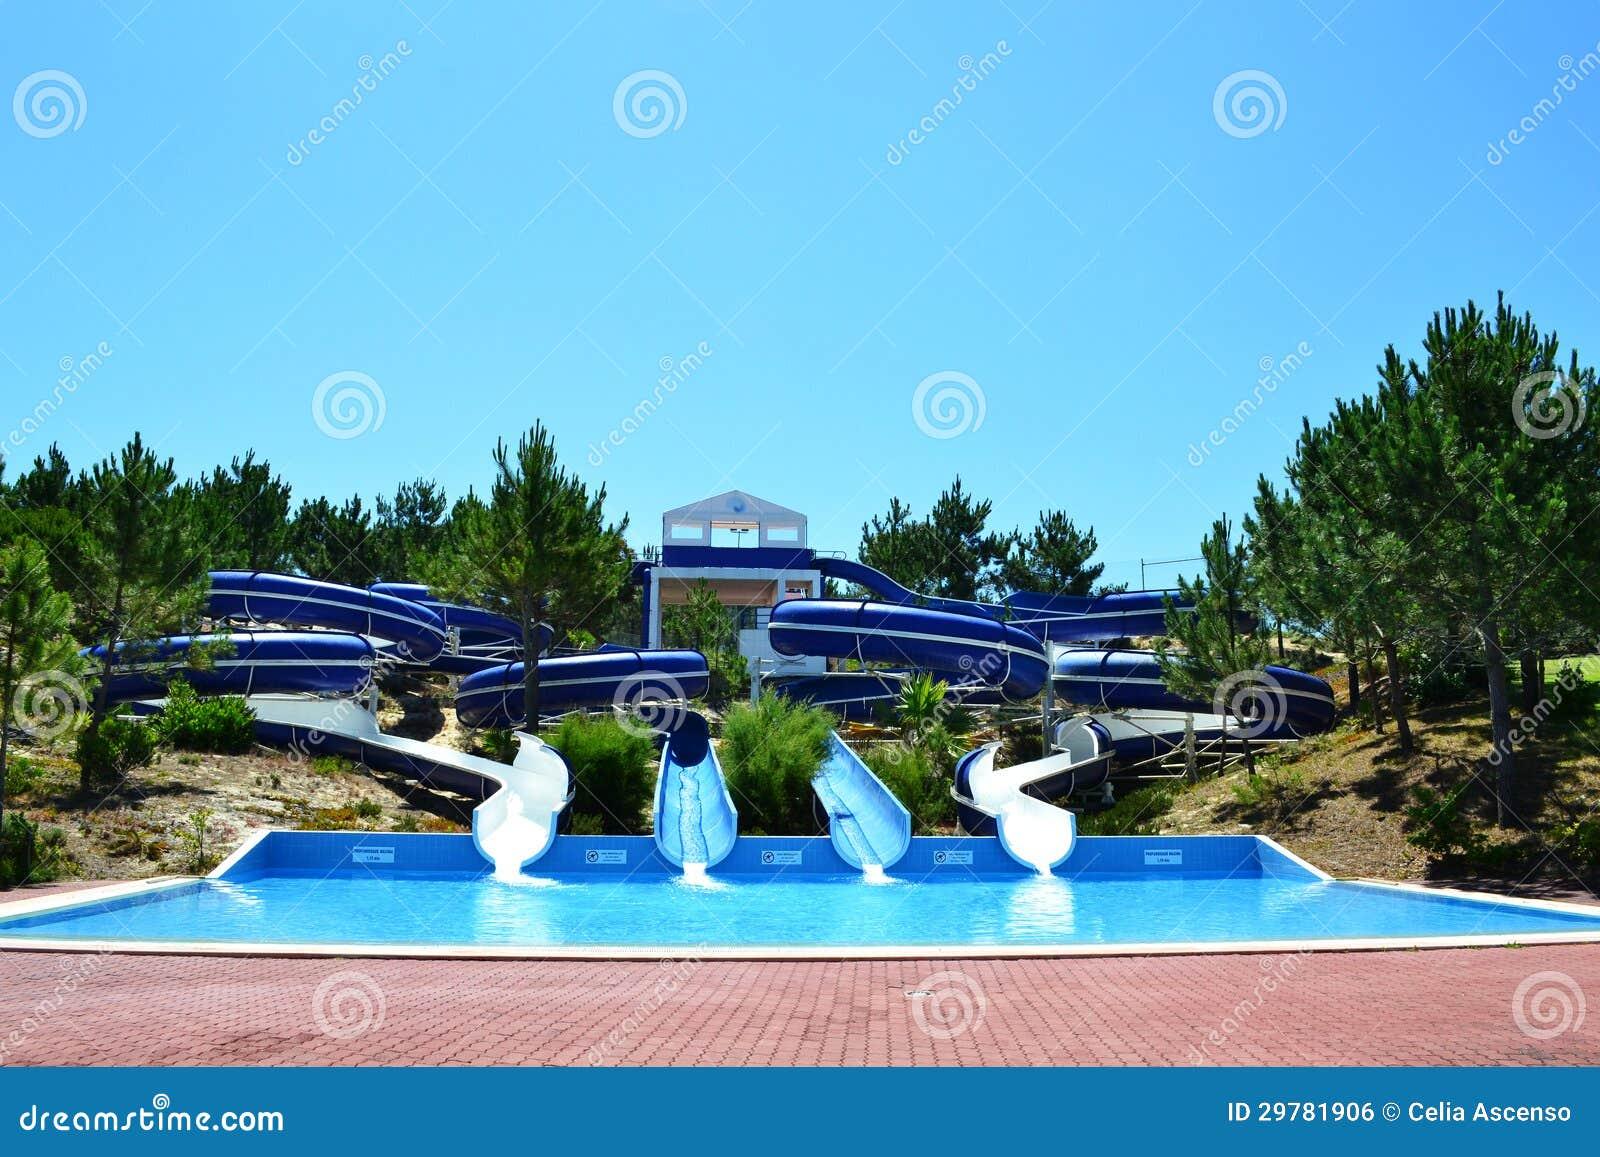 Aqua Park Slides Royalty Free Stock Image Image 29781906